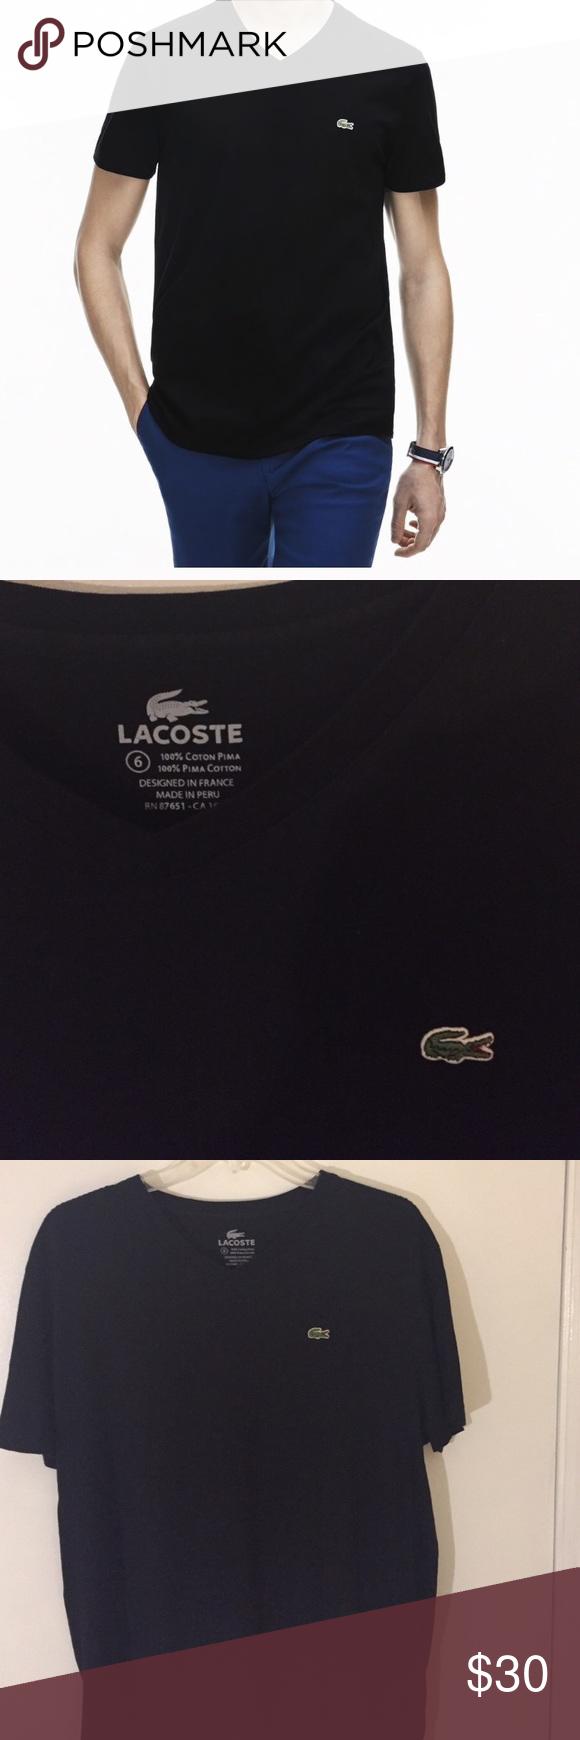 a920d47175f Men s Lacoste V-Neck Cotton T-Shirt - Large Great short sleeve t ...